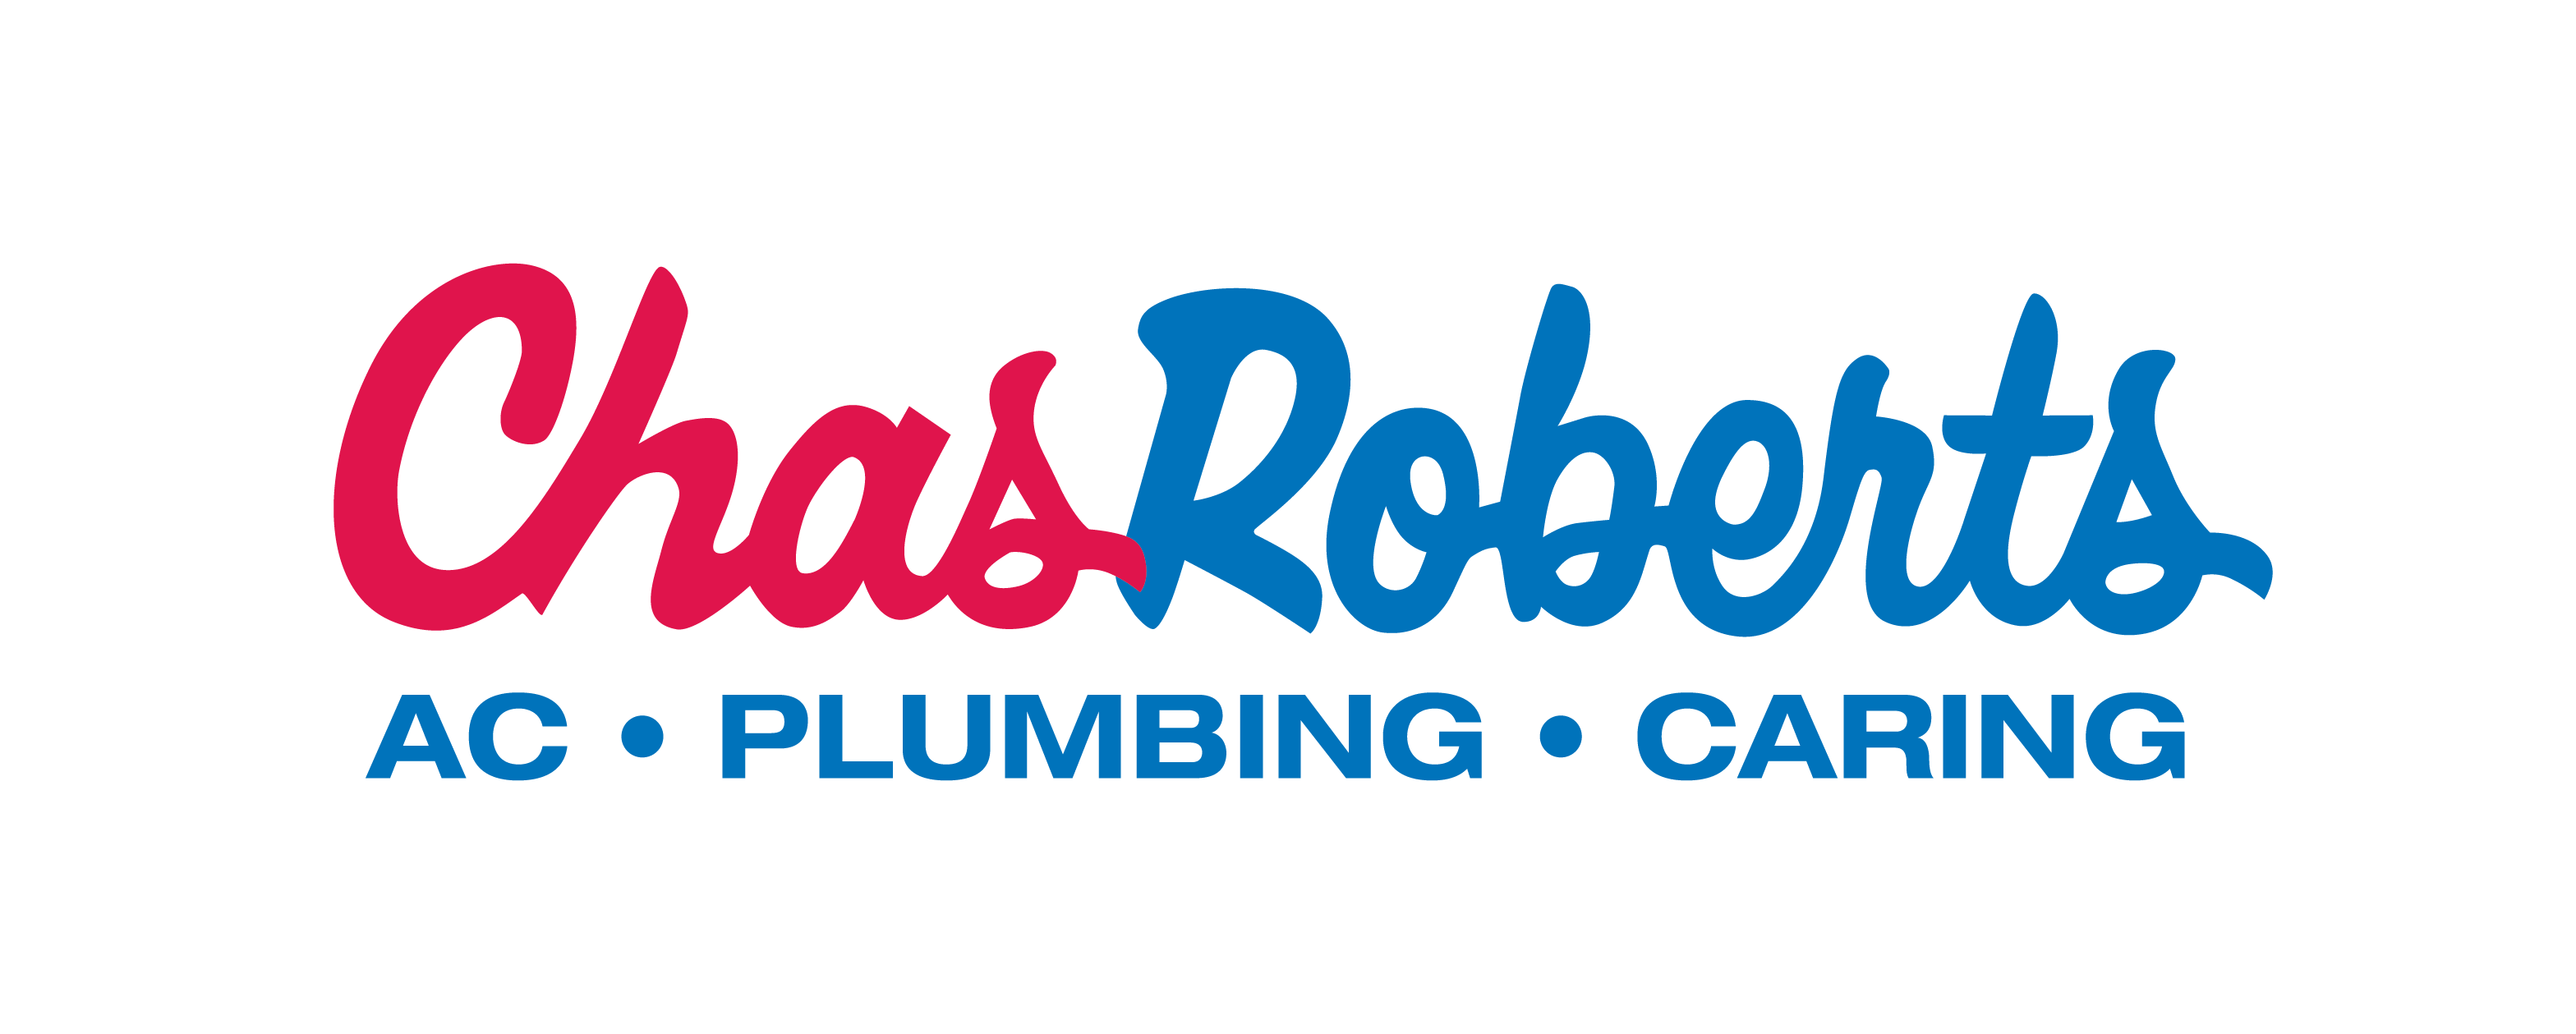 ChasRoberts_color_logo